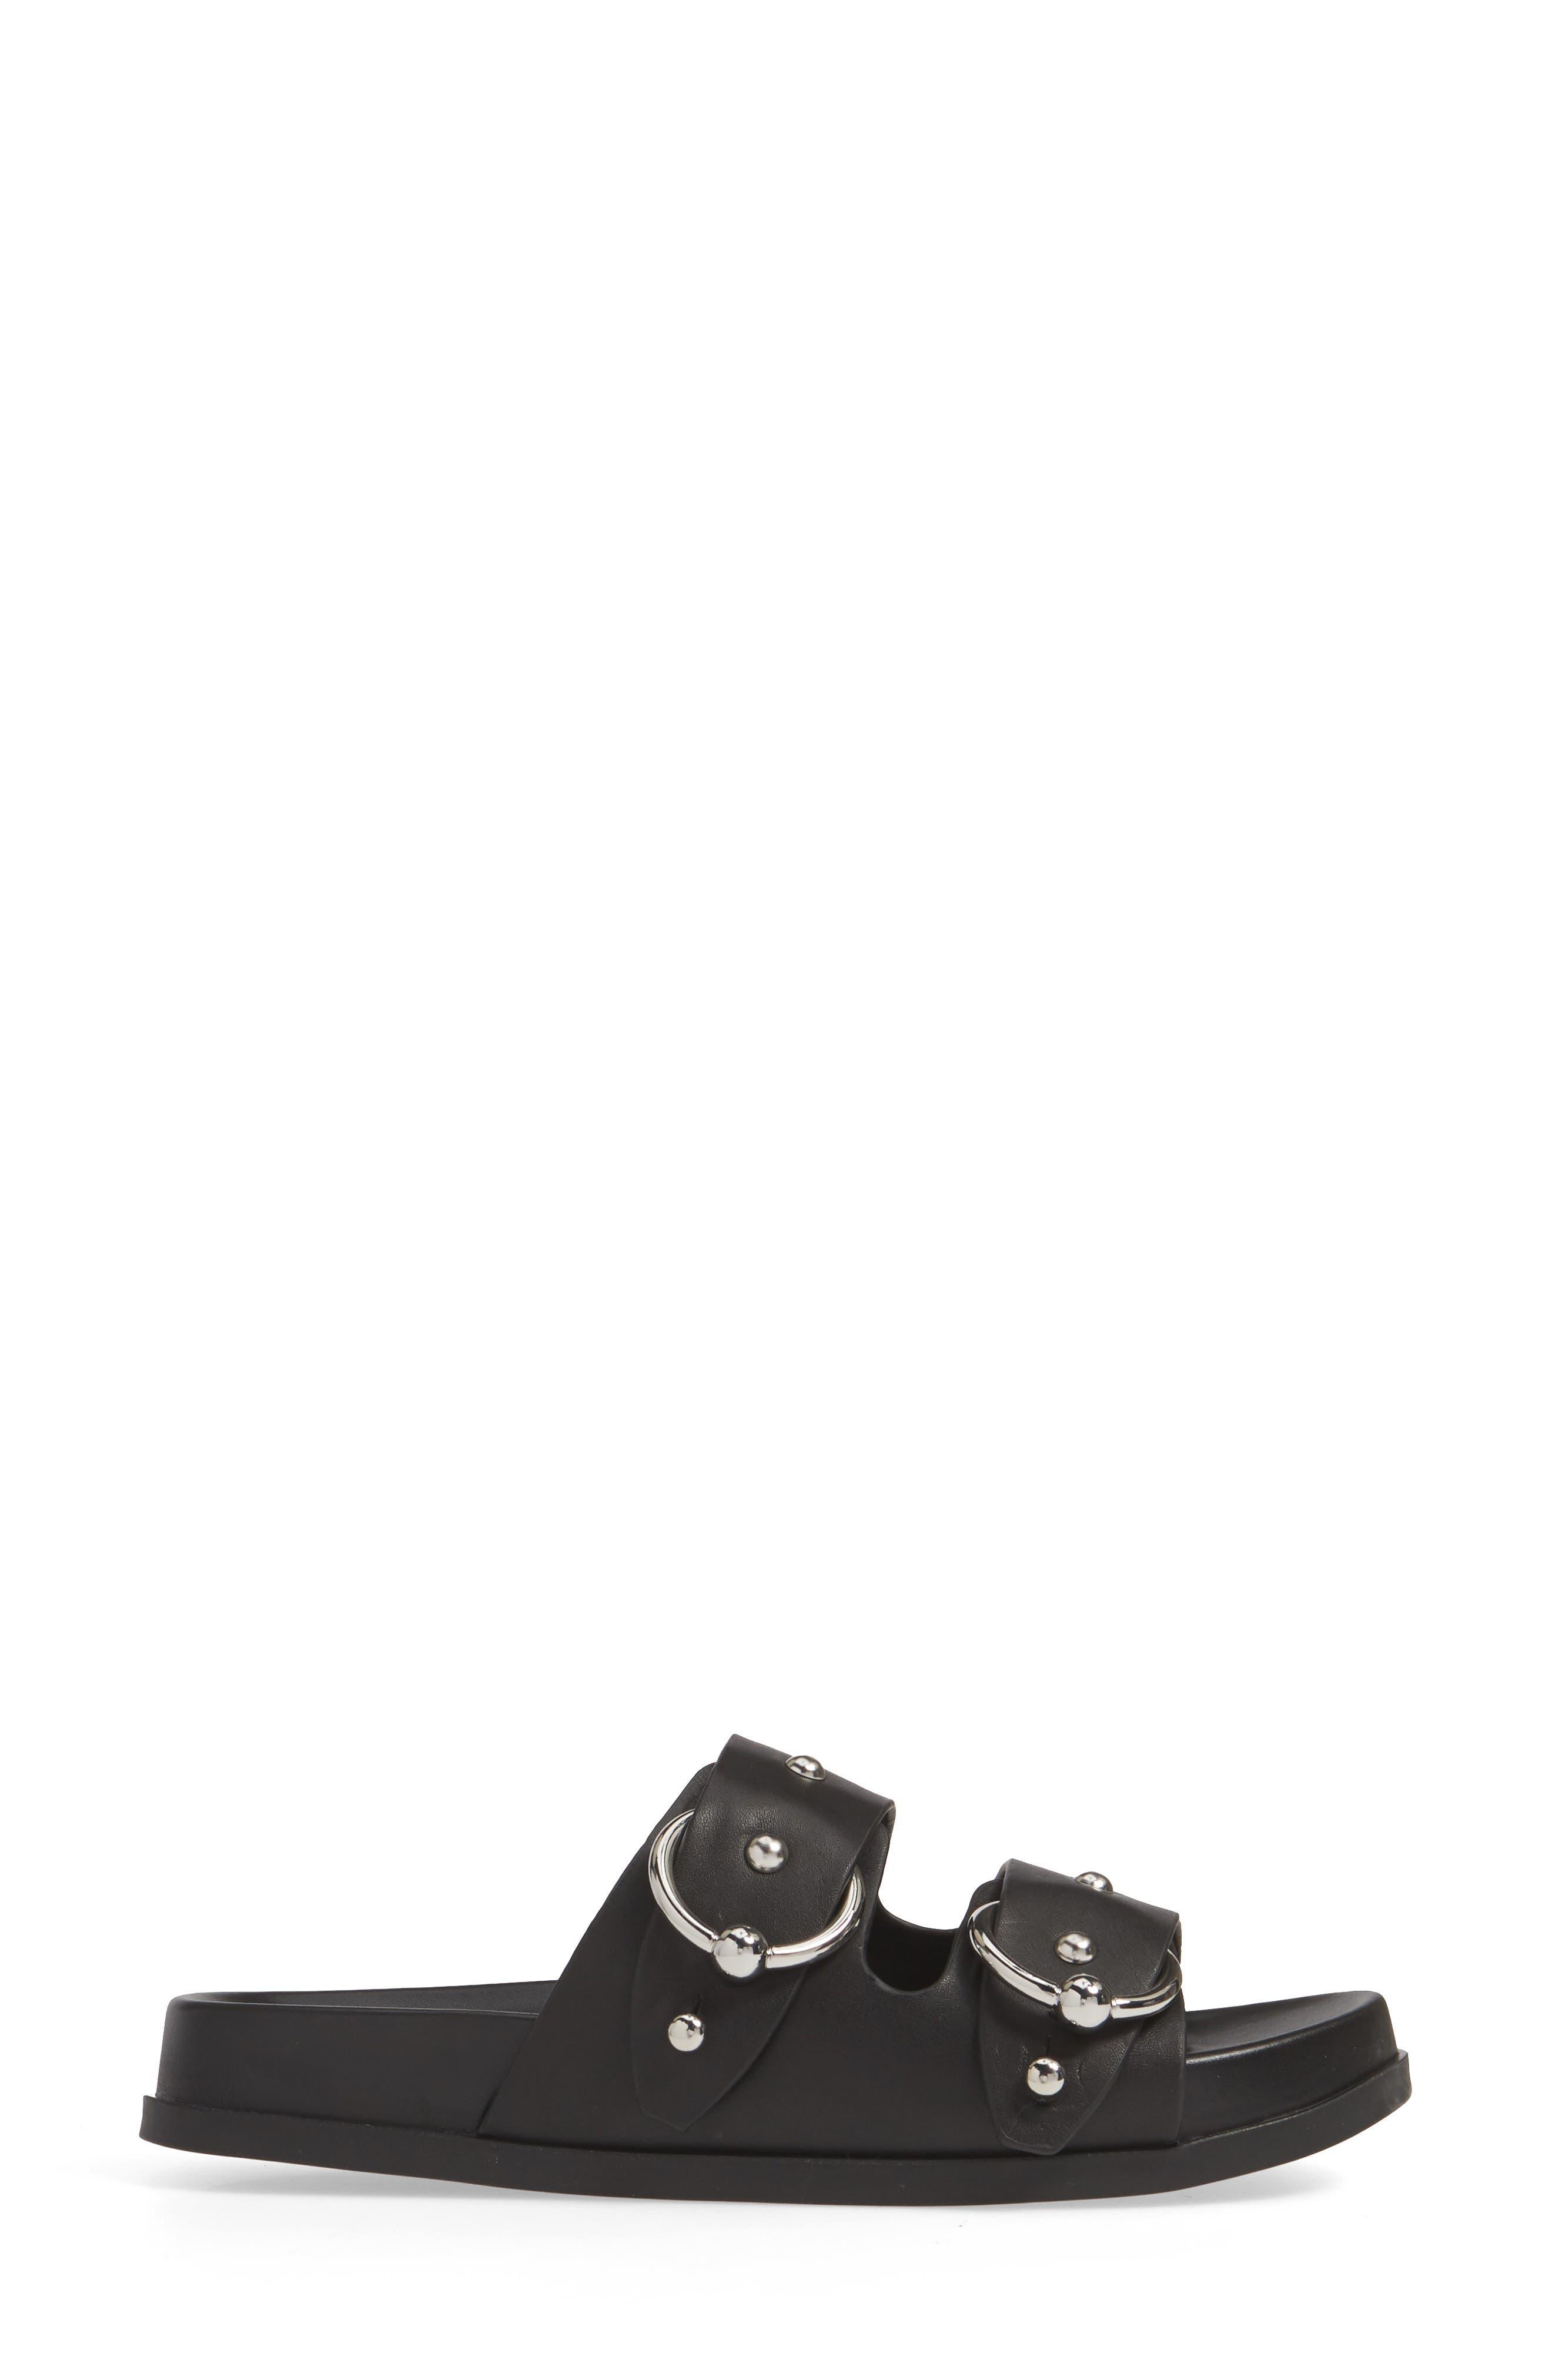 REBECCA MINKOFF, Vachel Slide Sandal, Alternate thumbnail 3, color, BLACK LEATHER